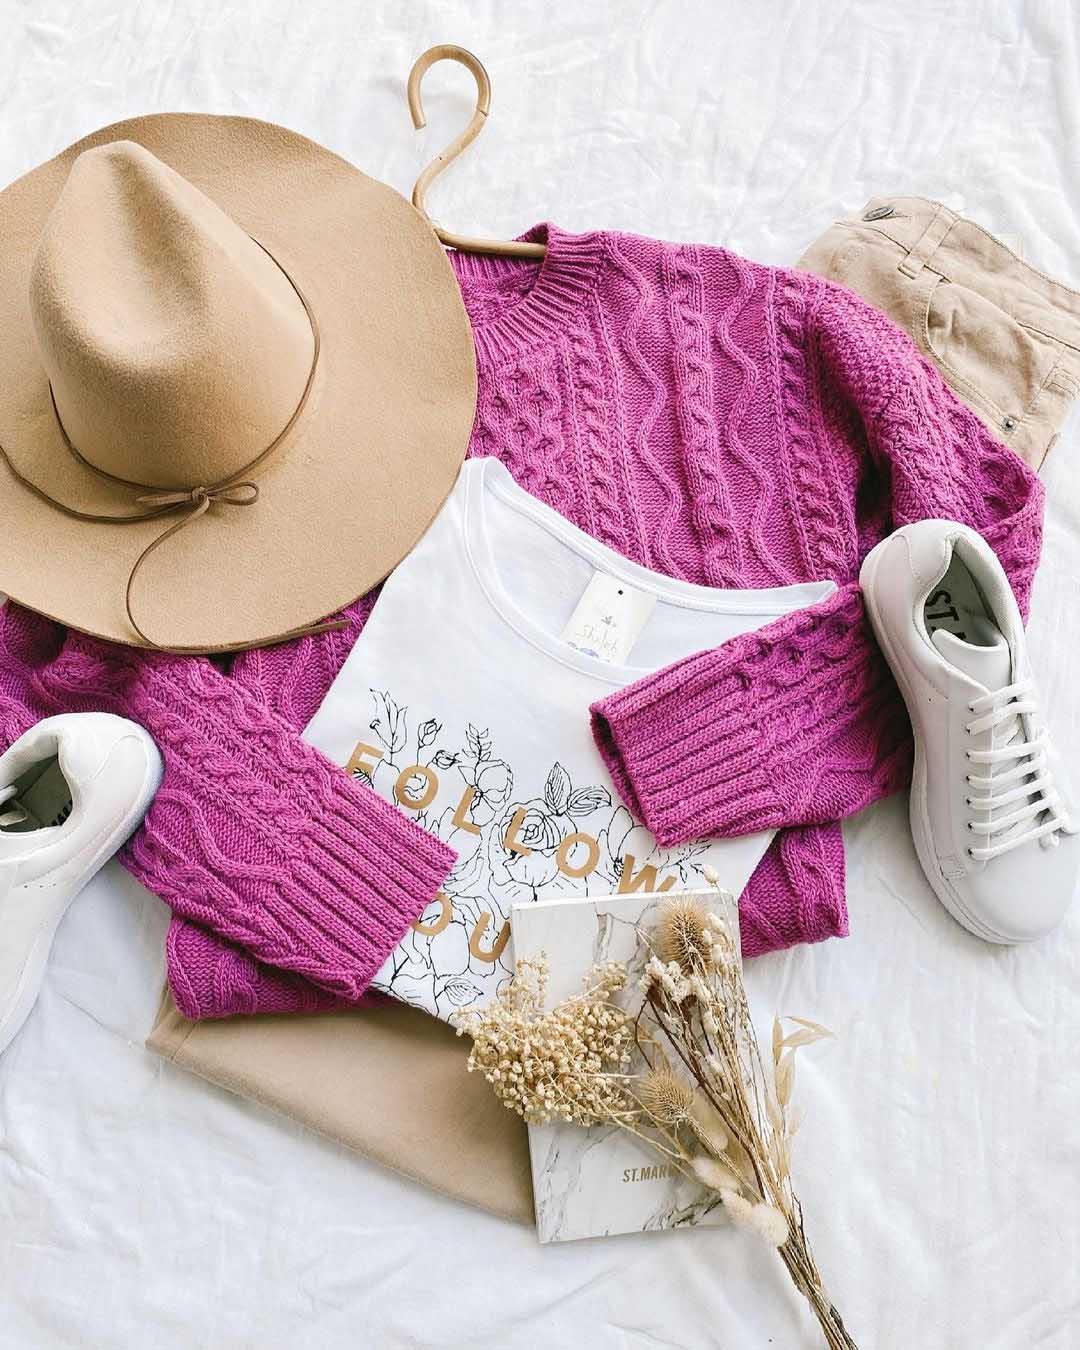 ropa de mujer invierno 2021 sweaters remeras pantalones